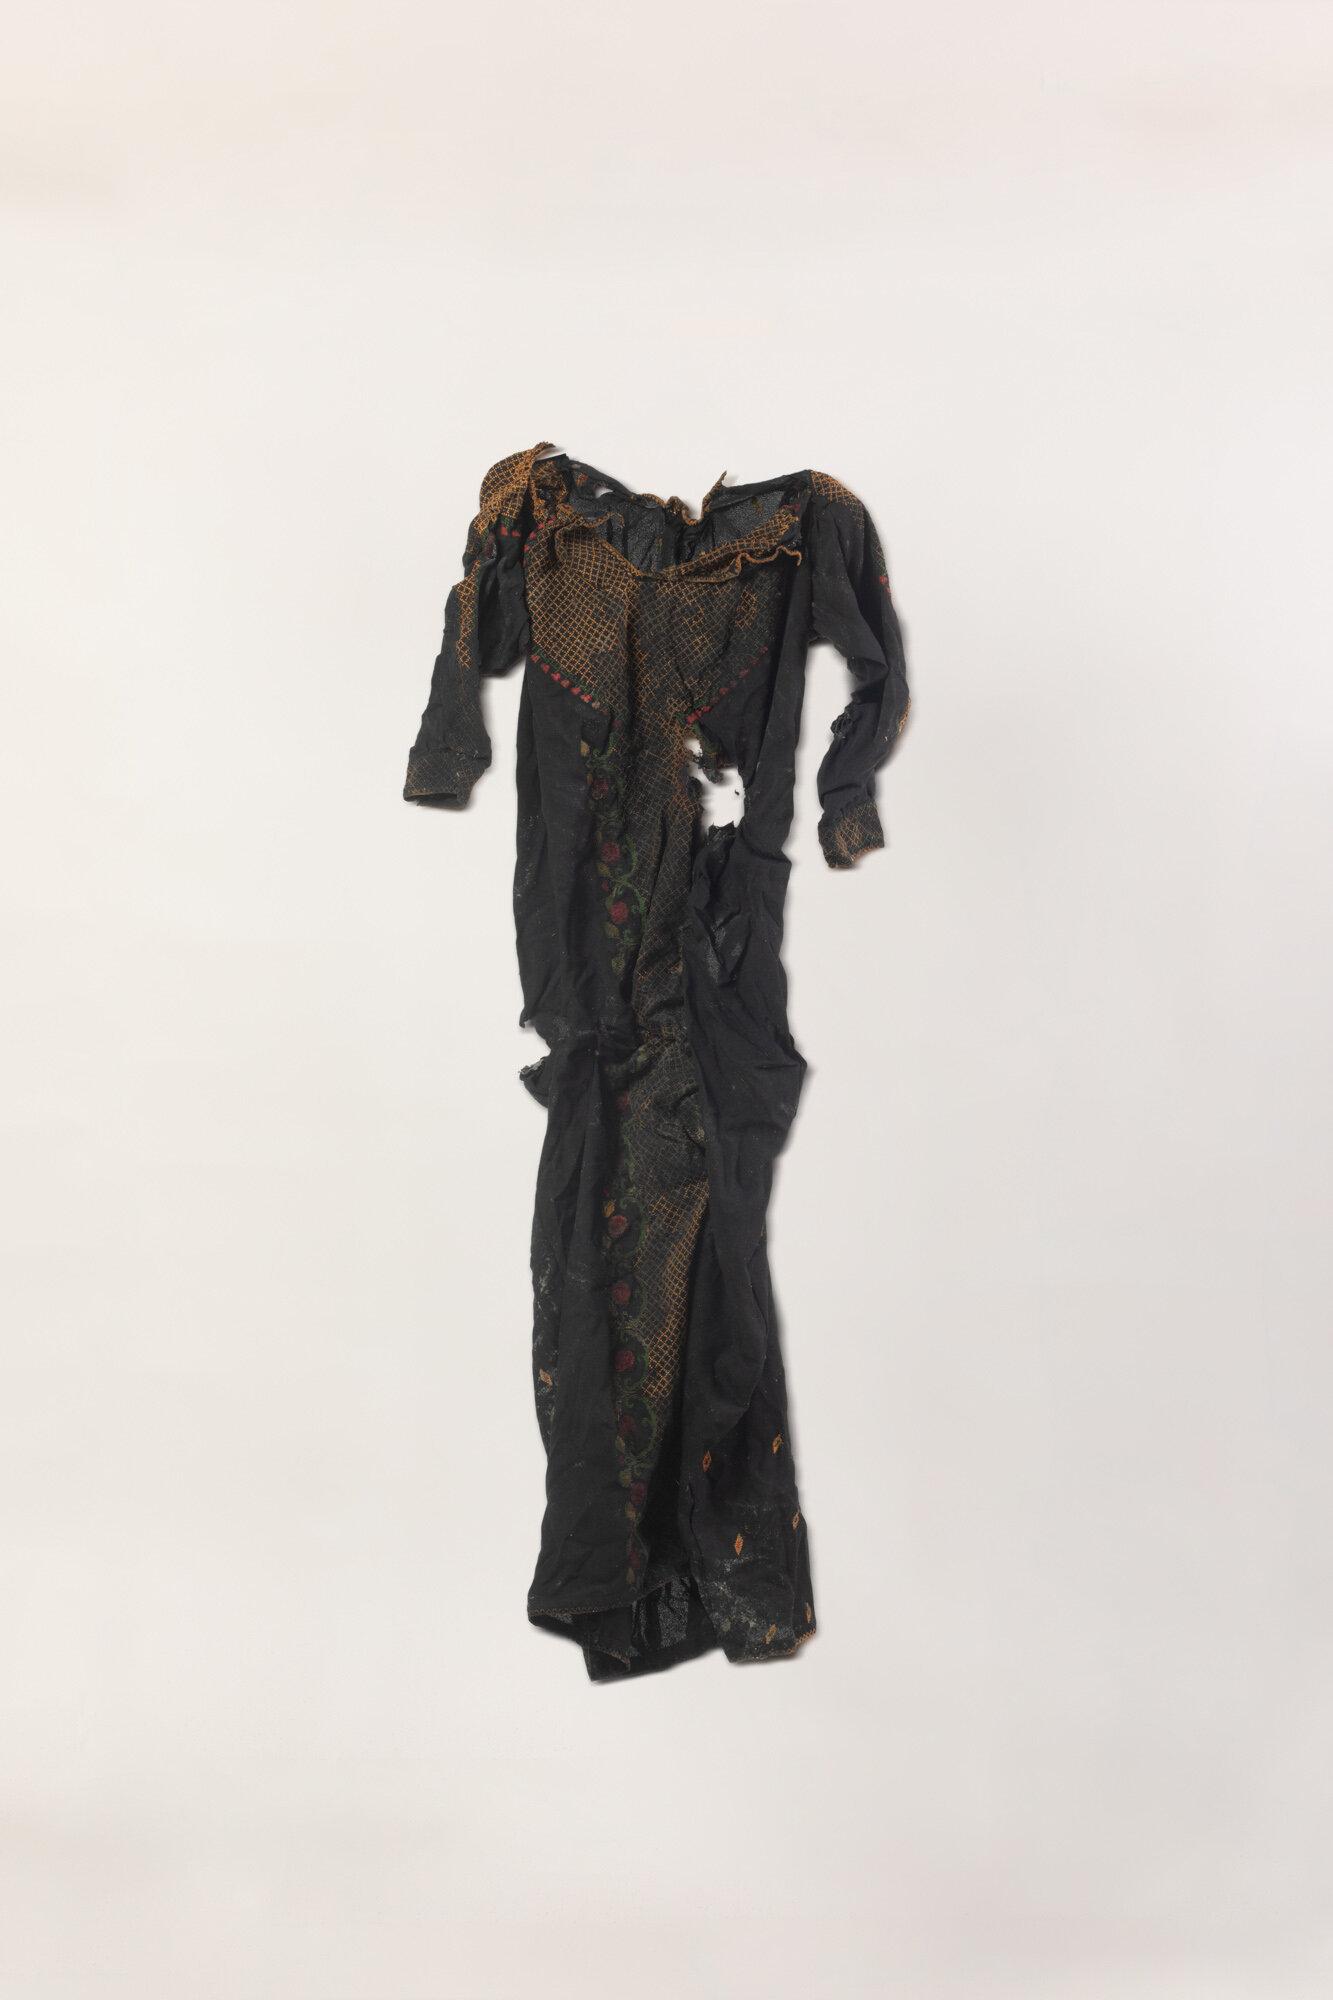 Dress6DressOnNaturalBackground.jpg